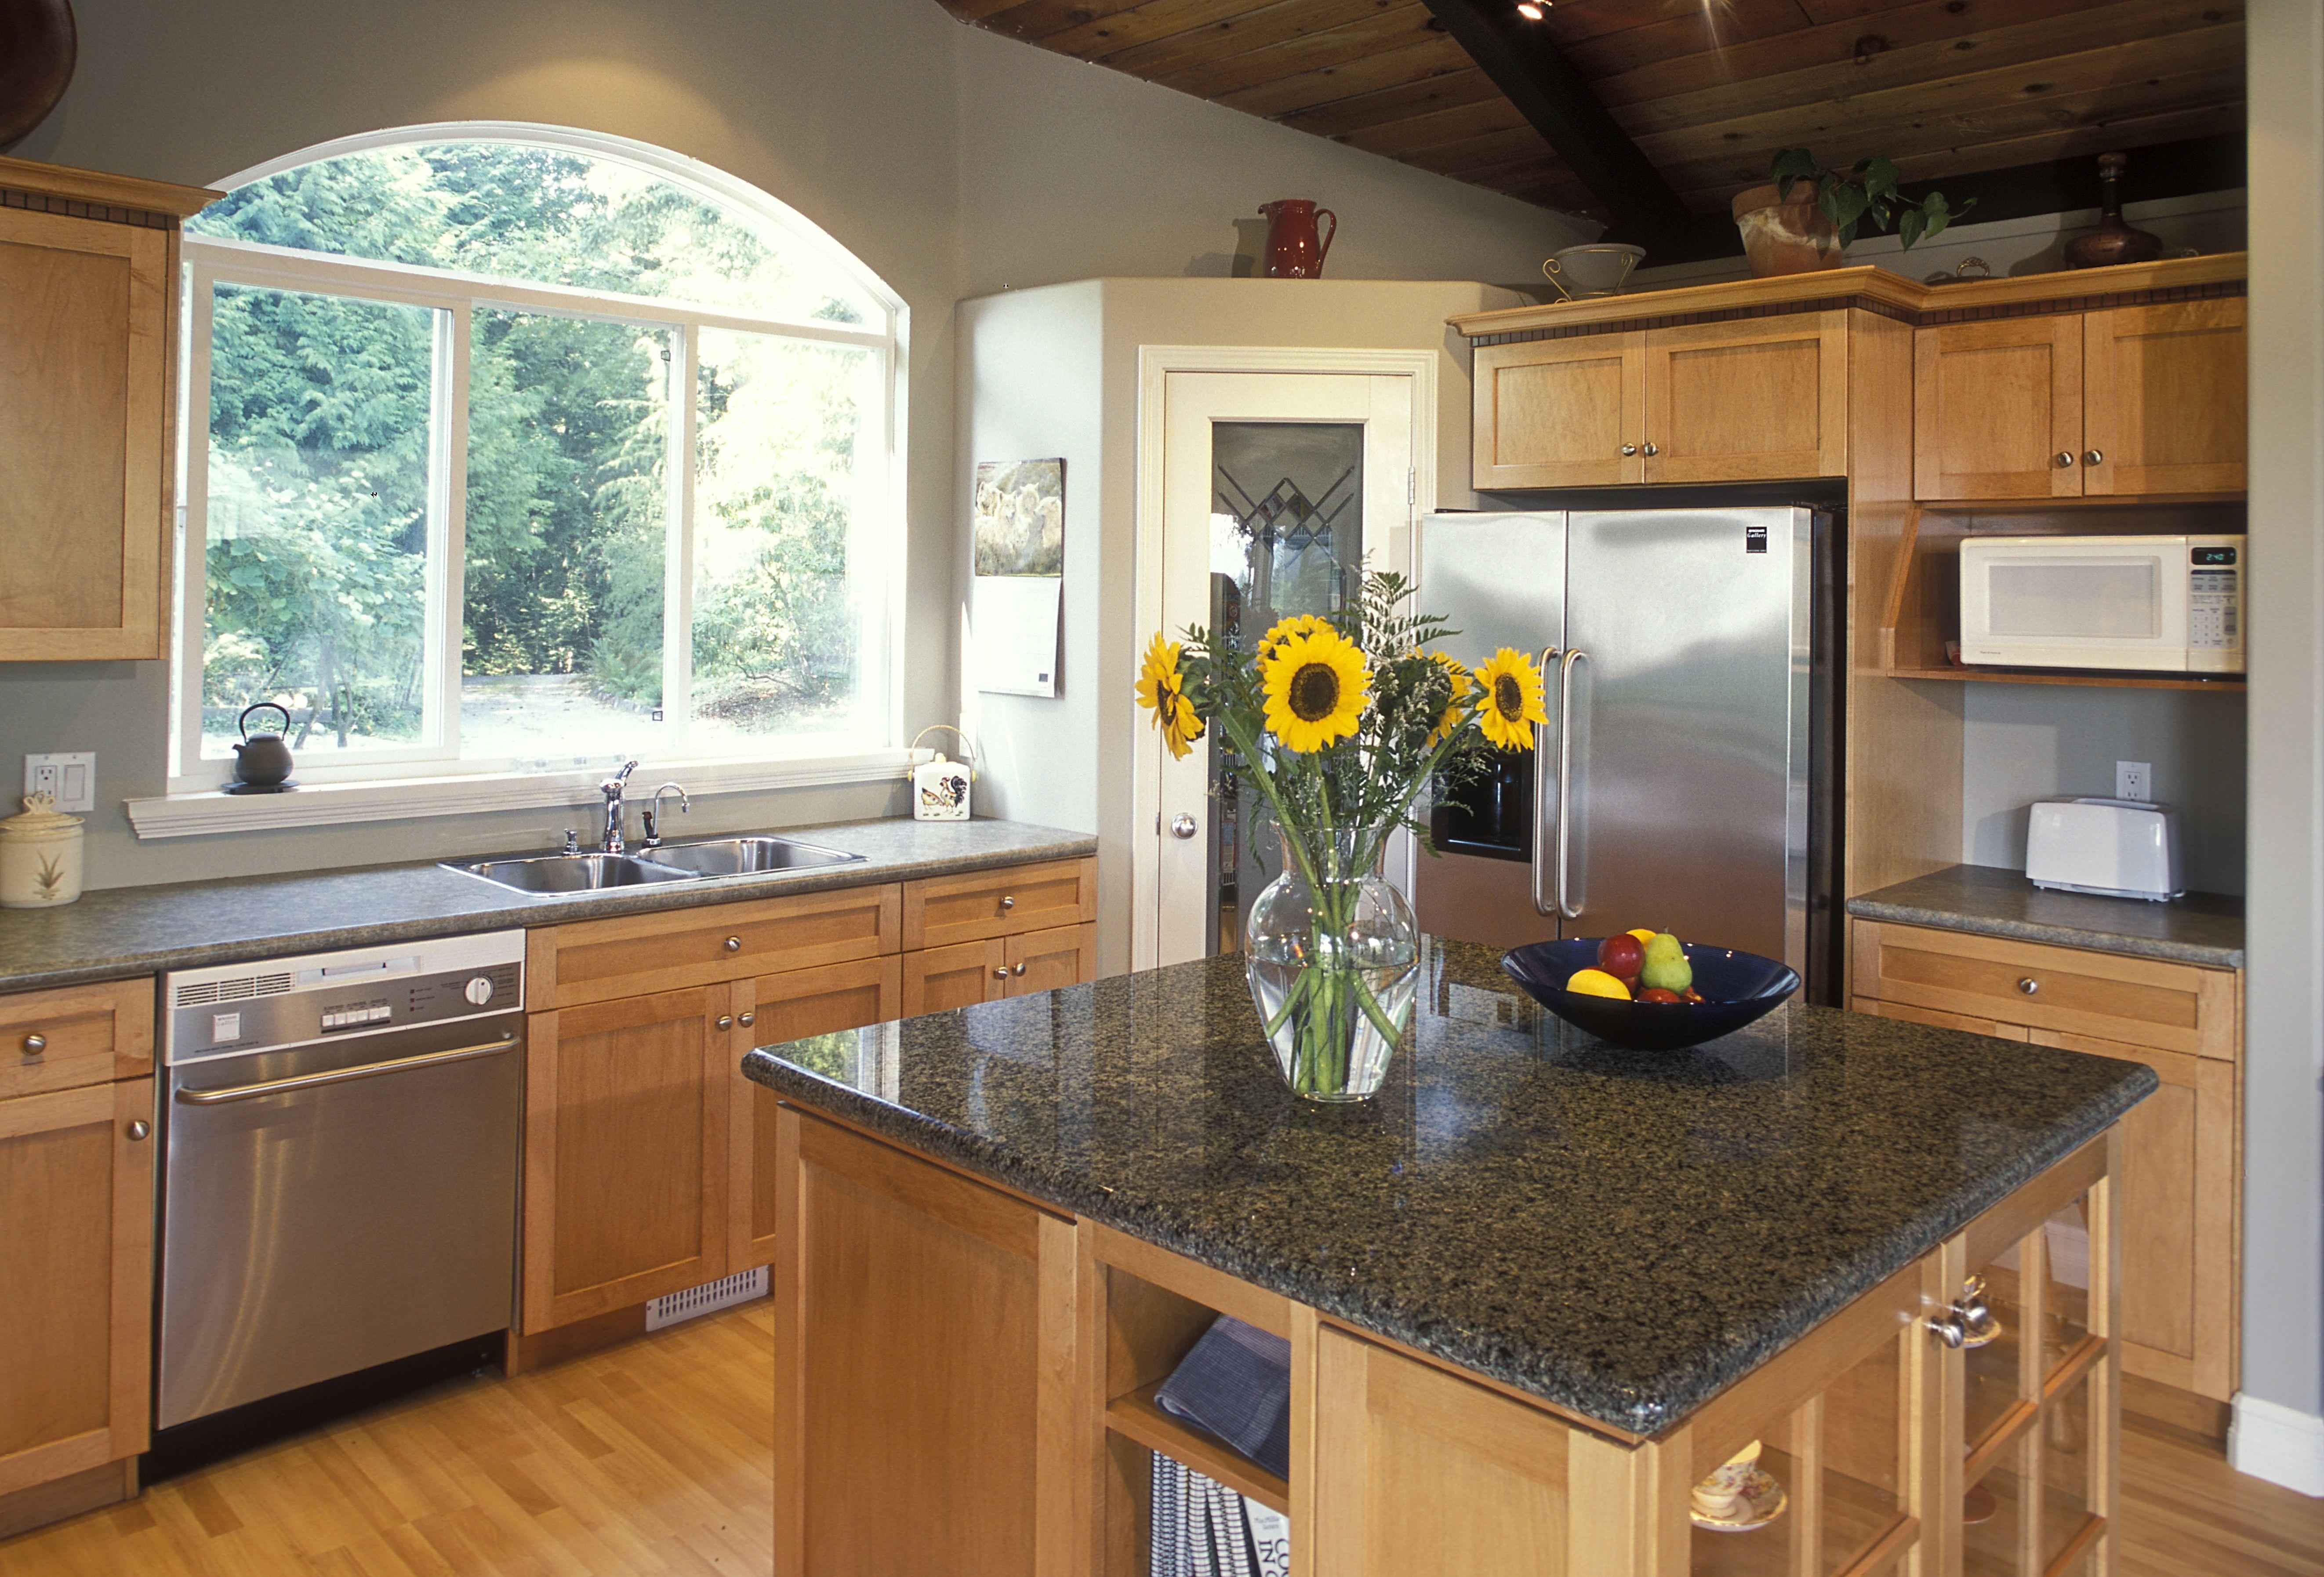 Kitchen Remodel Return On Investment Roi Kitchen Counter Decor Counter Decor Kitchen Decor